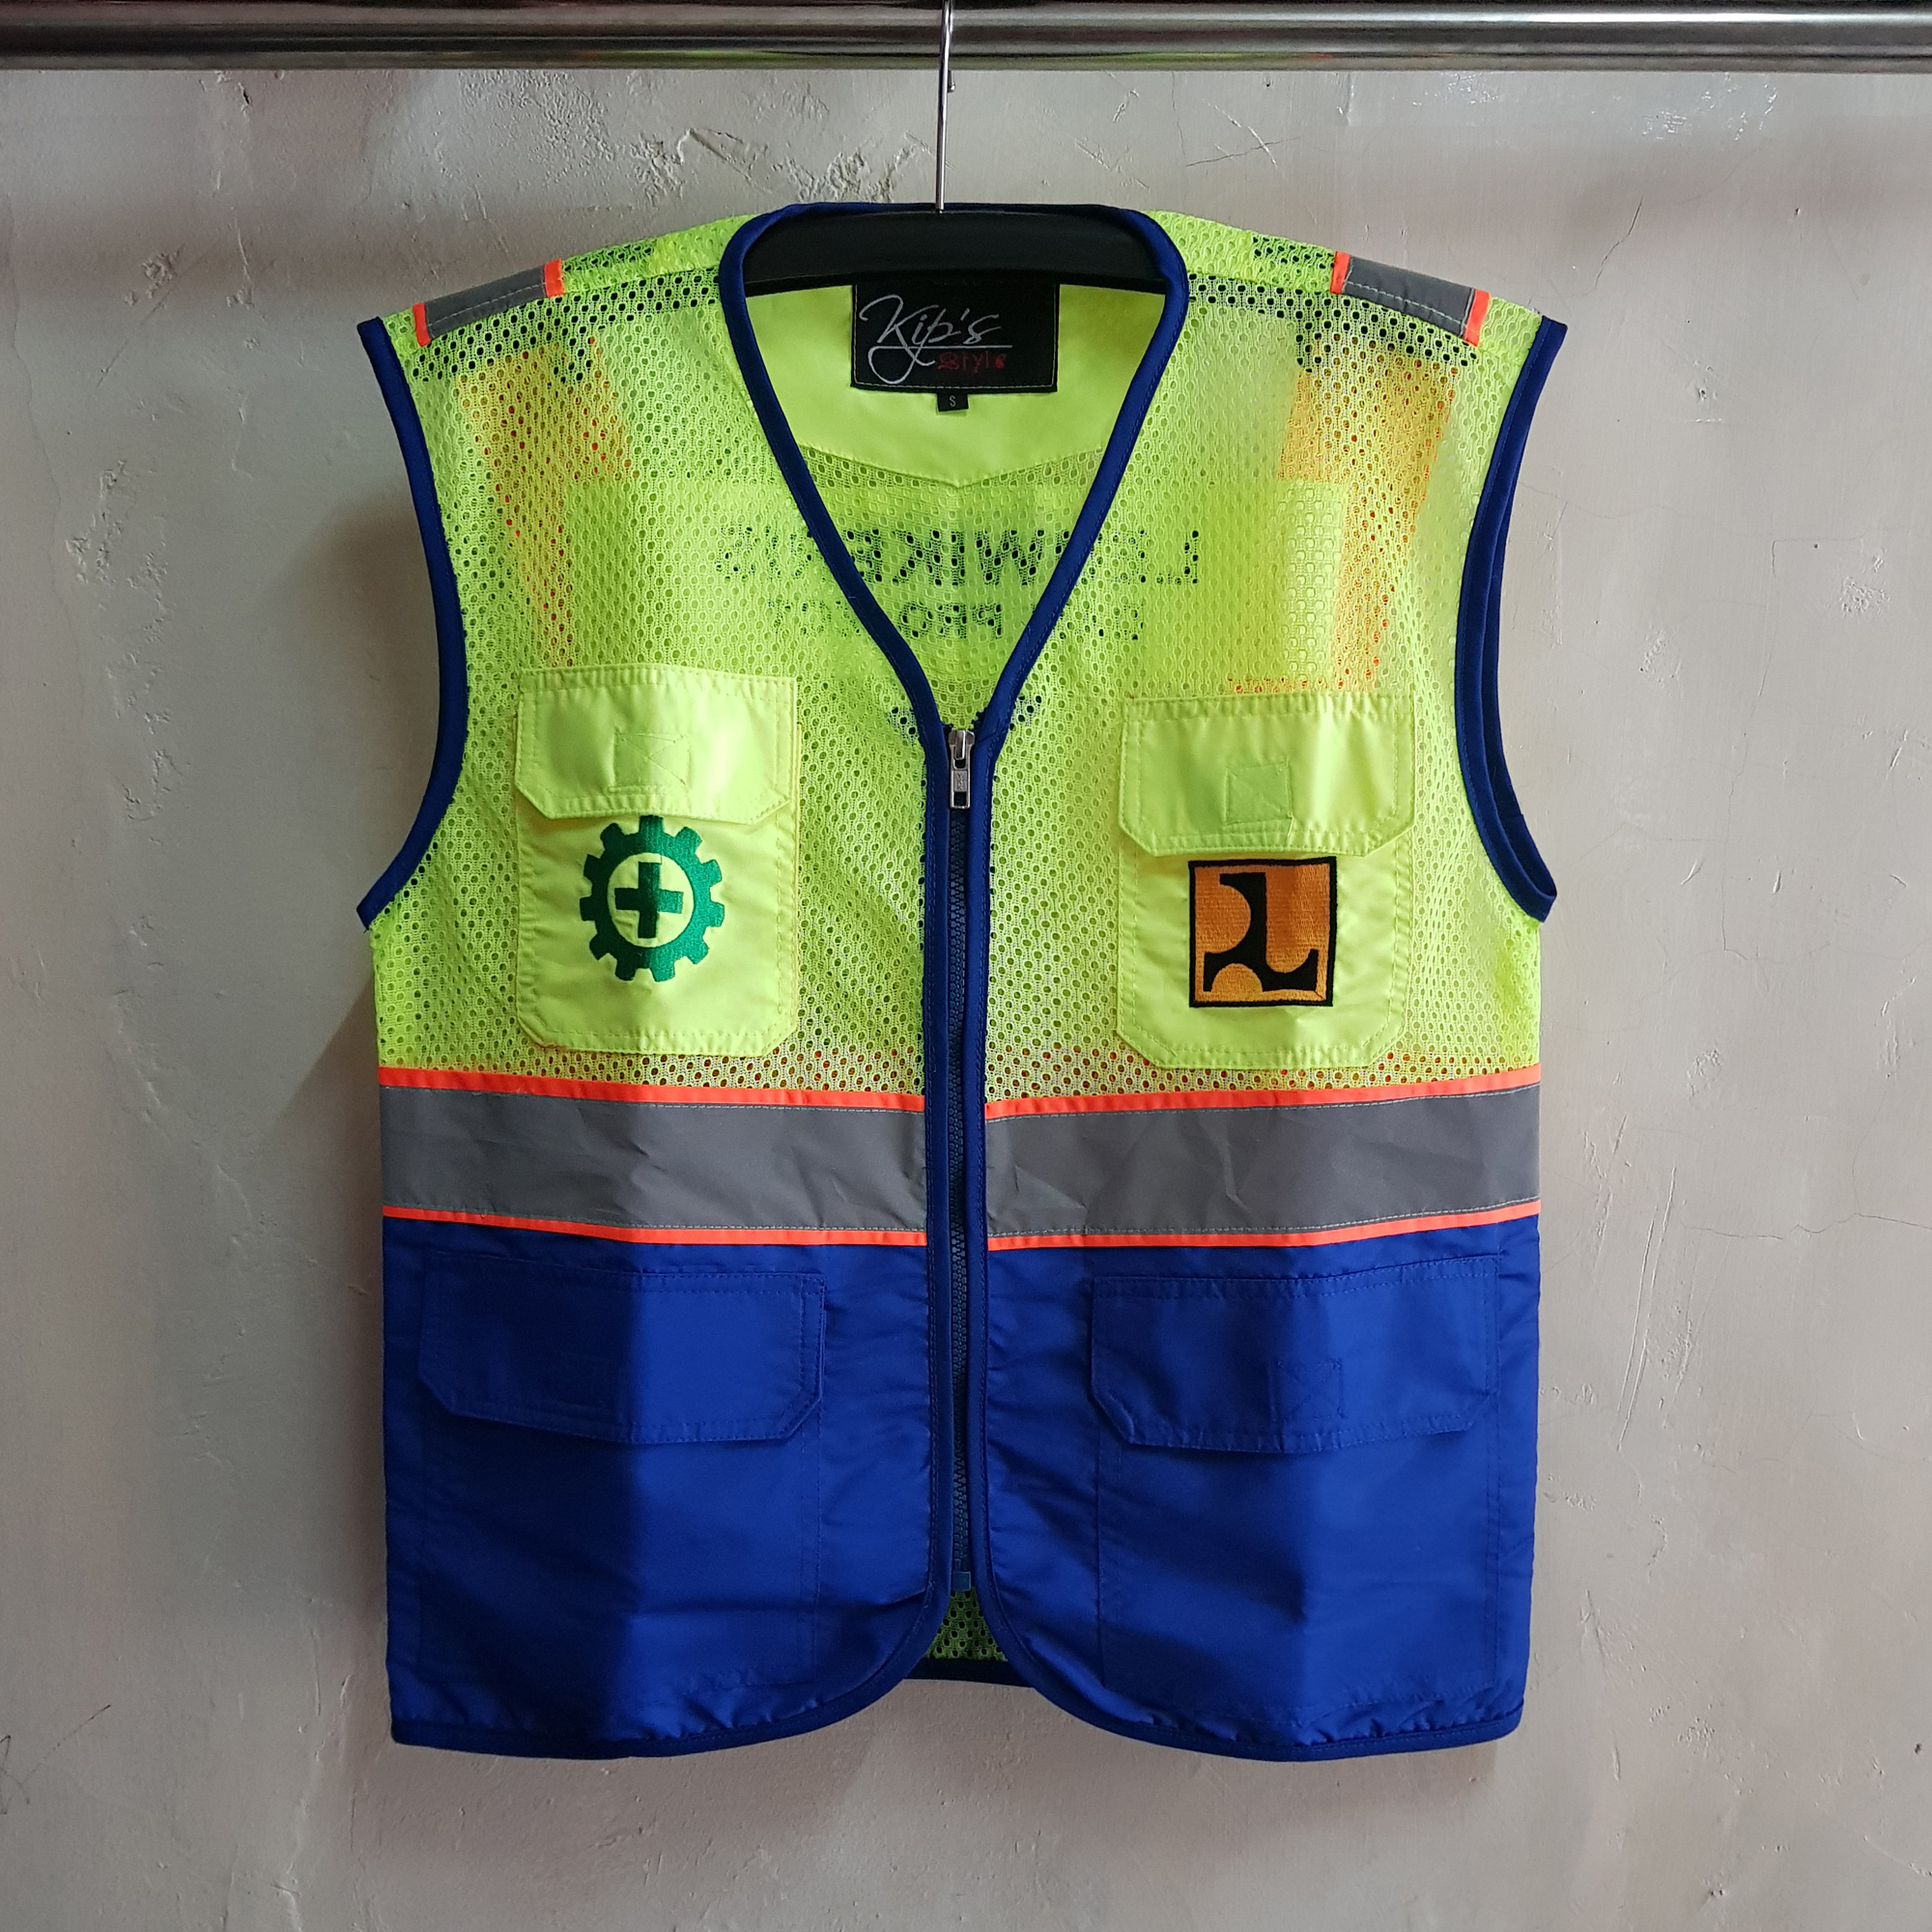 Rompi Taslan dan Jala, Seragam Safety PU